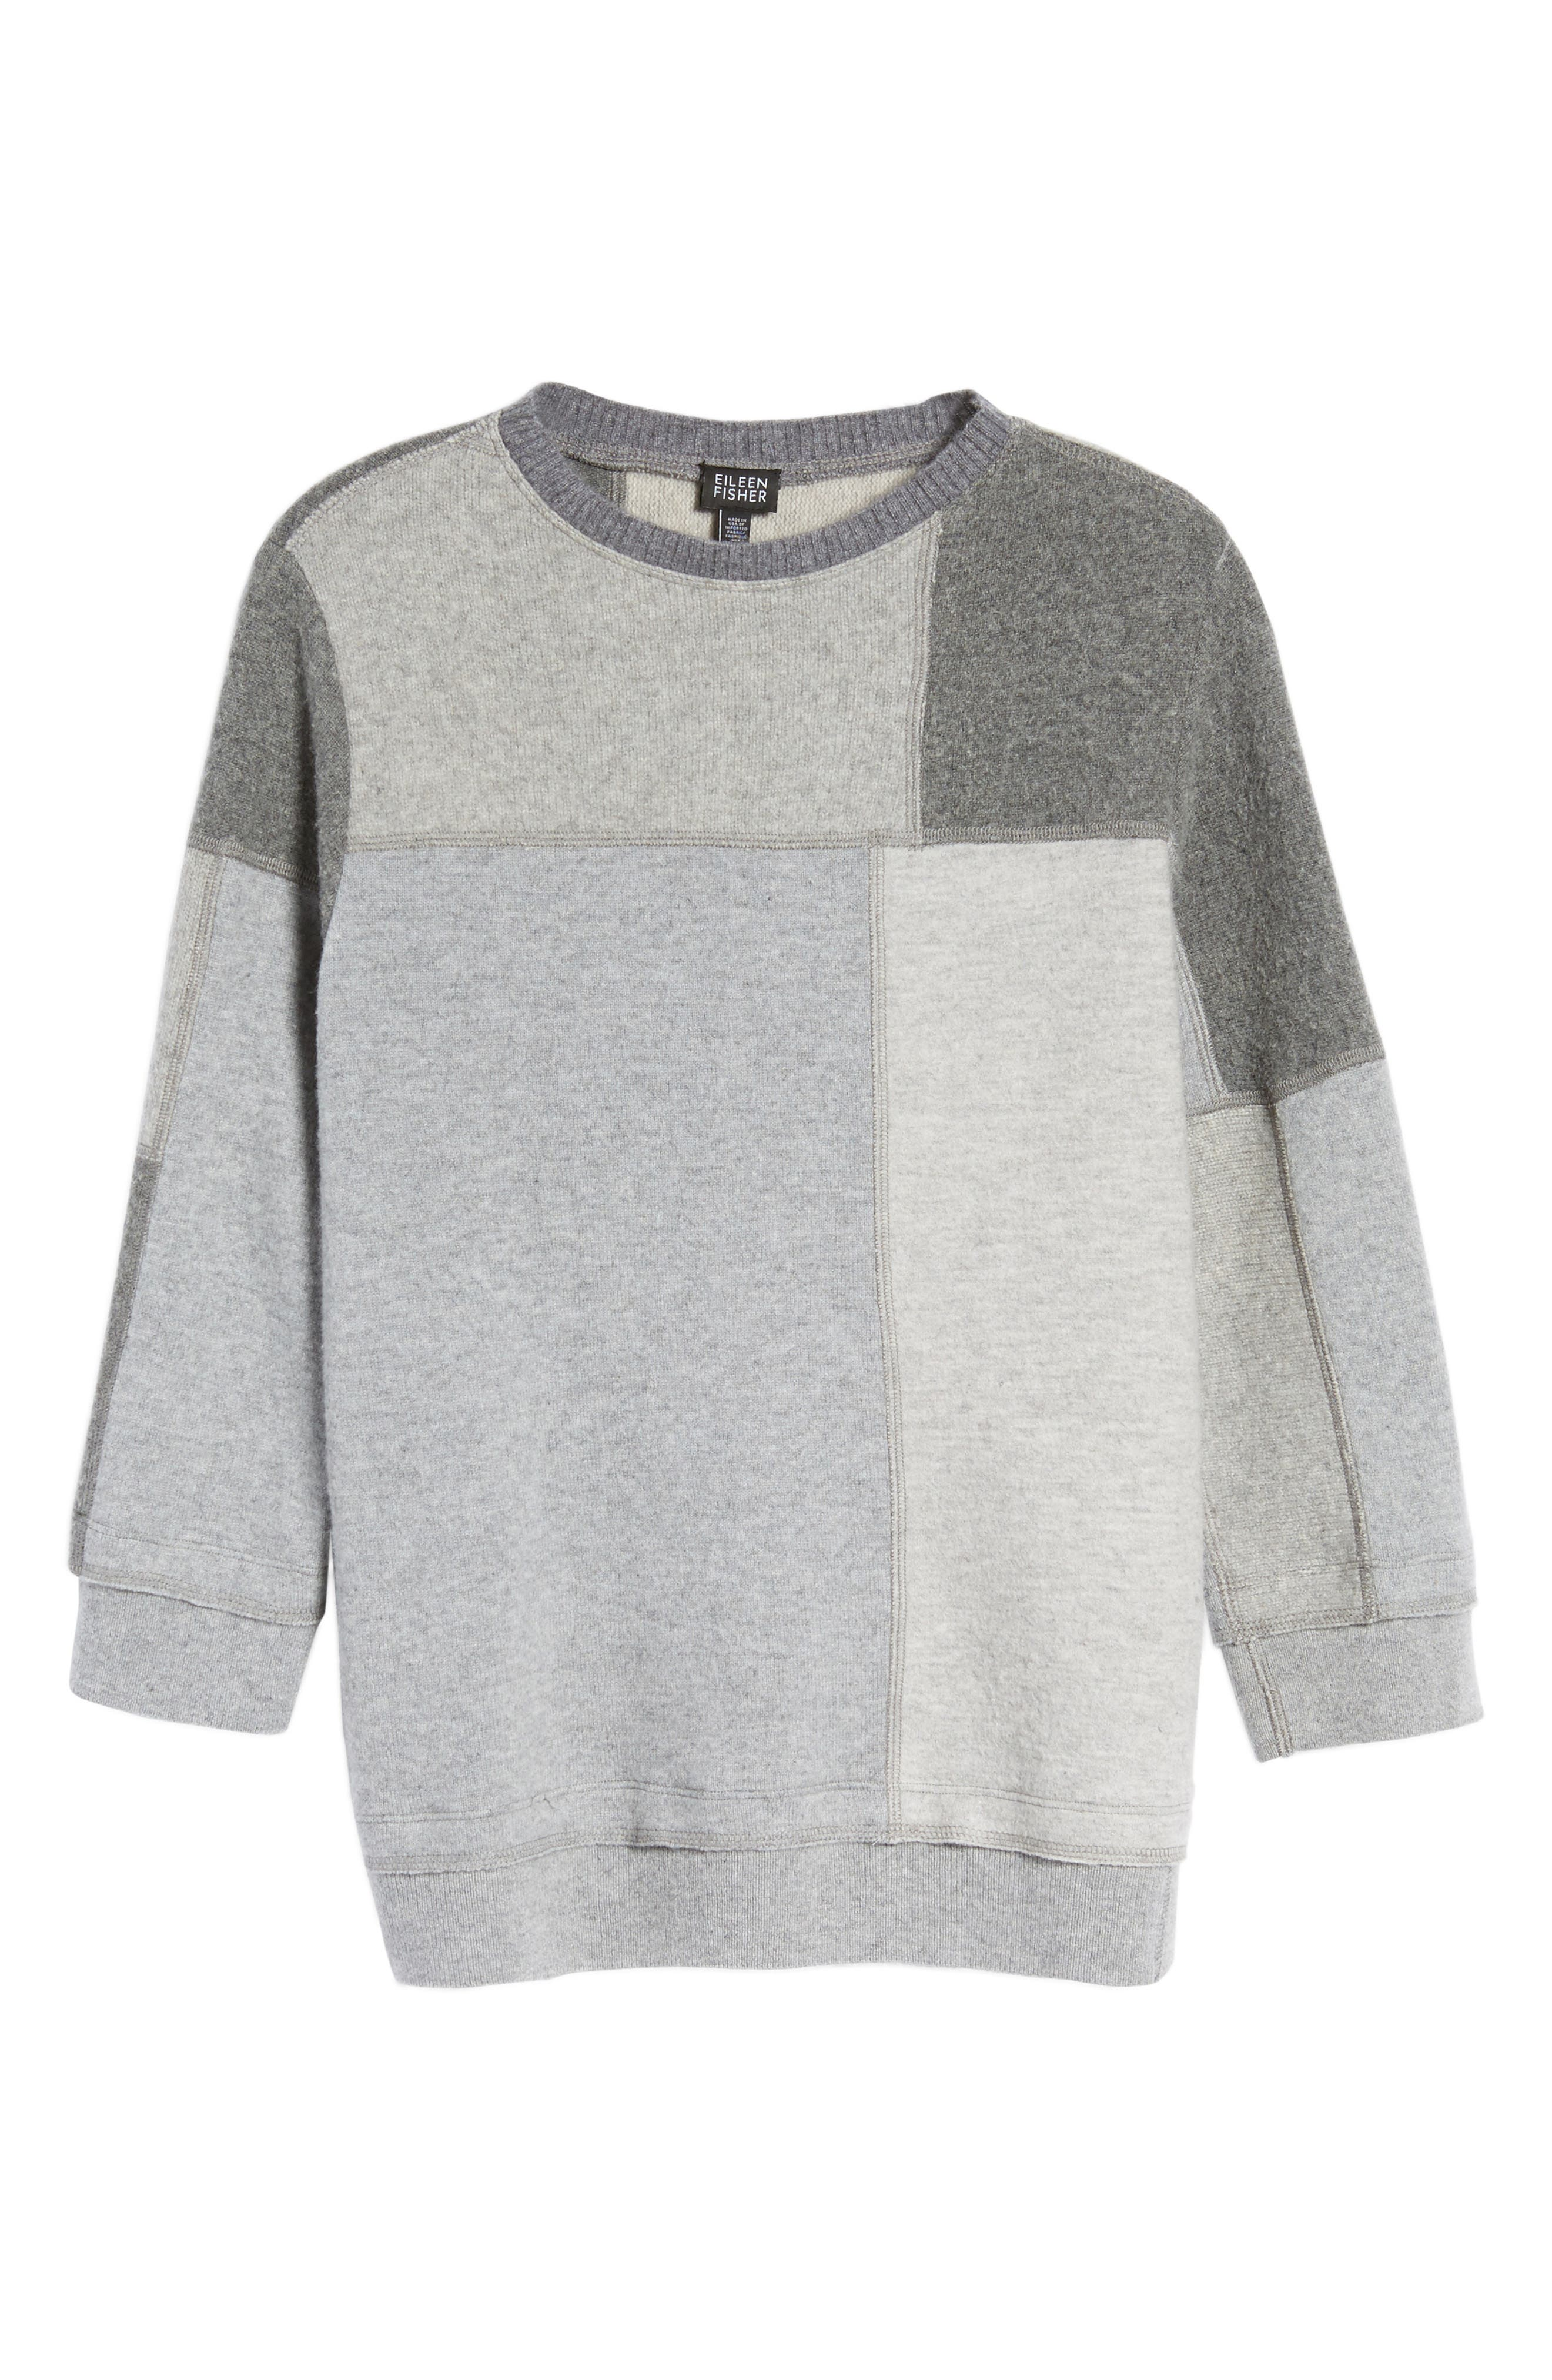 Colorblock Cashmere Sweater,                             Alternate thumbnail 6, color,                             Grey